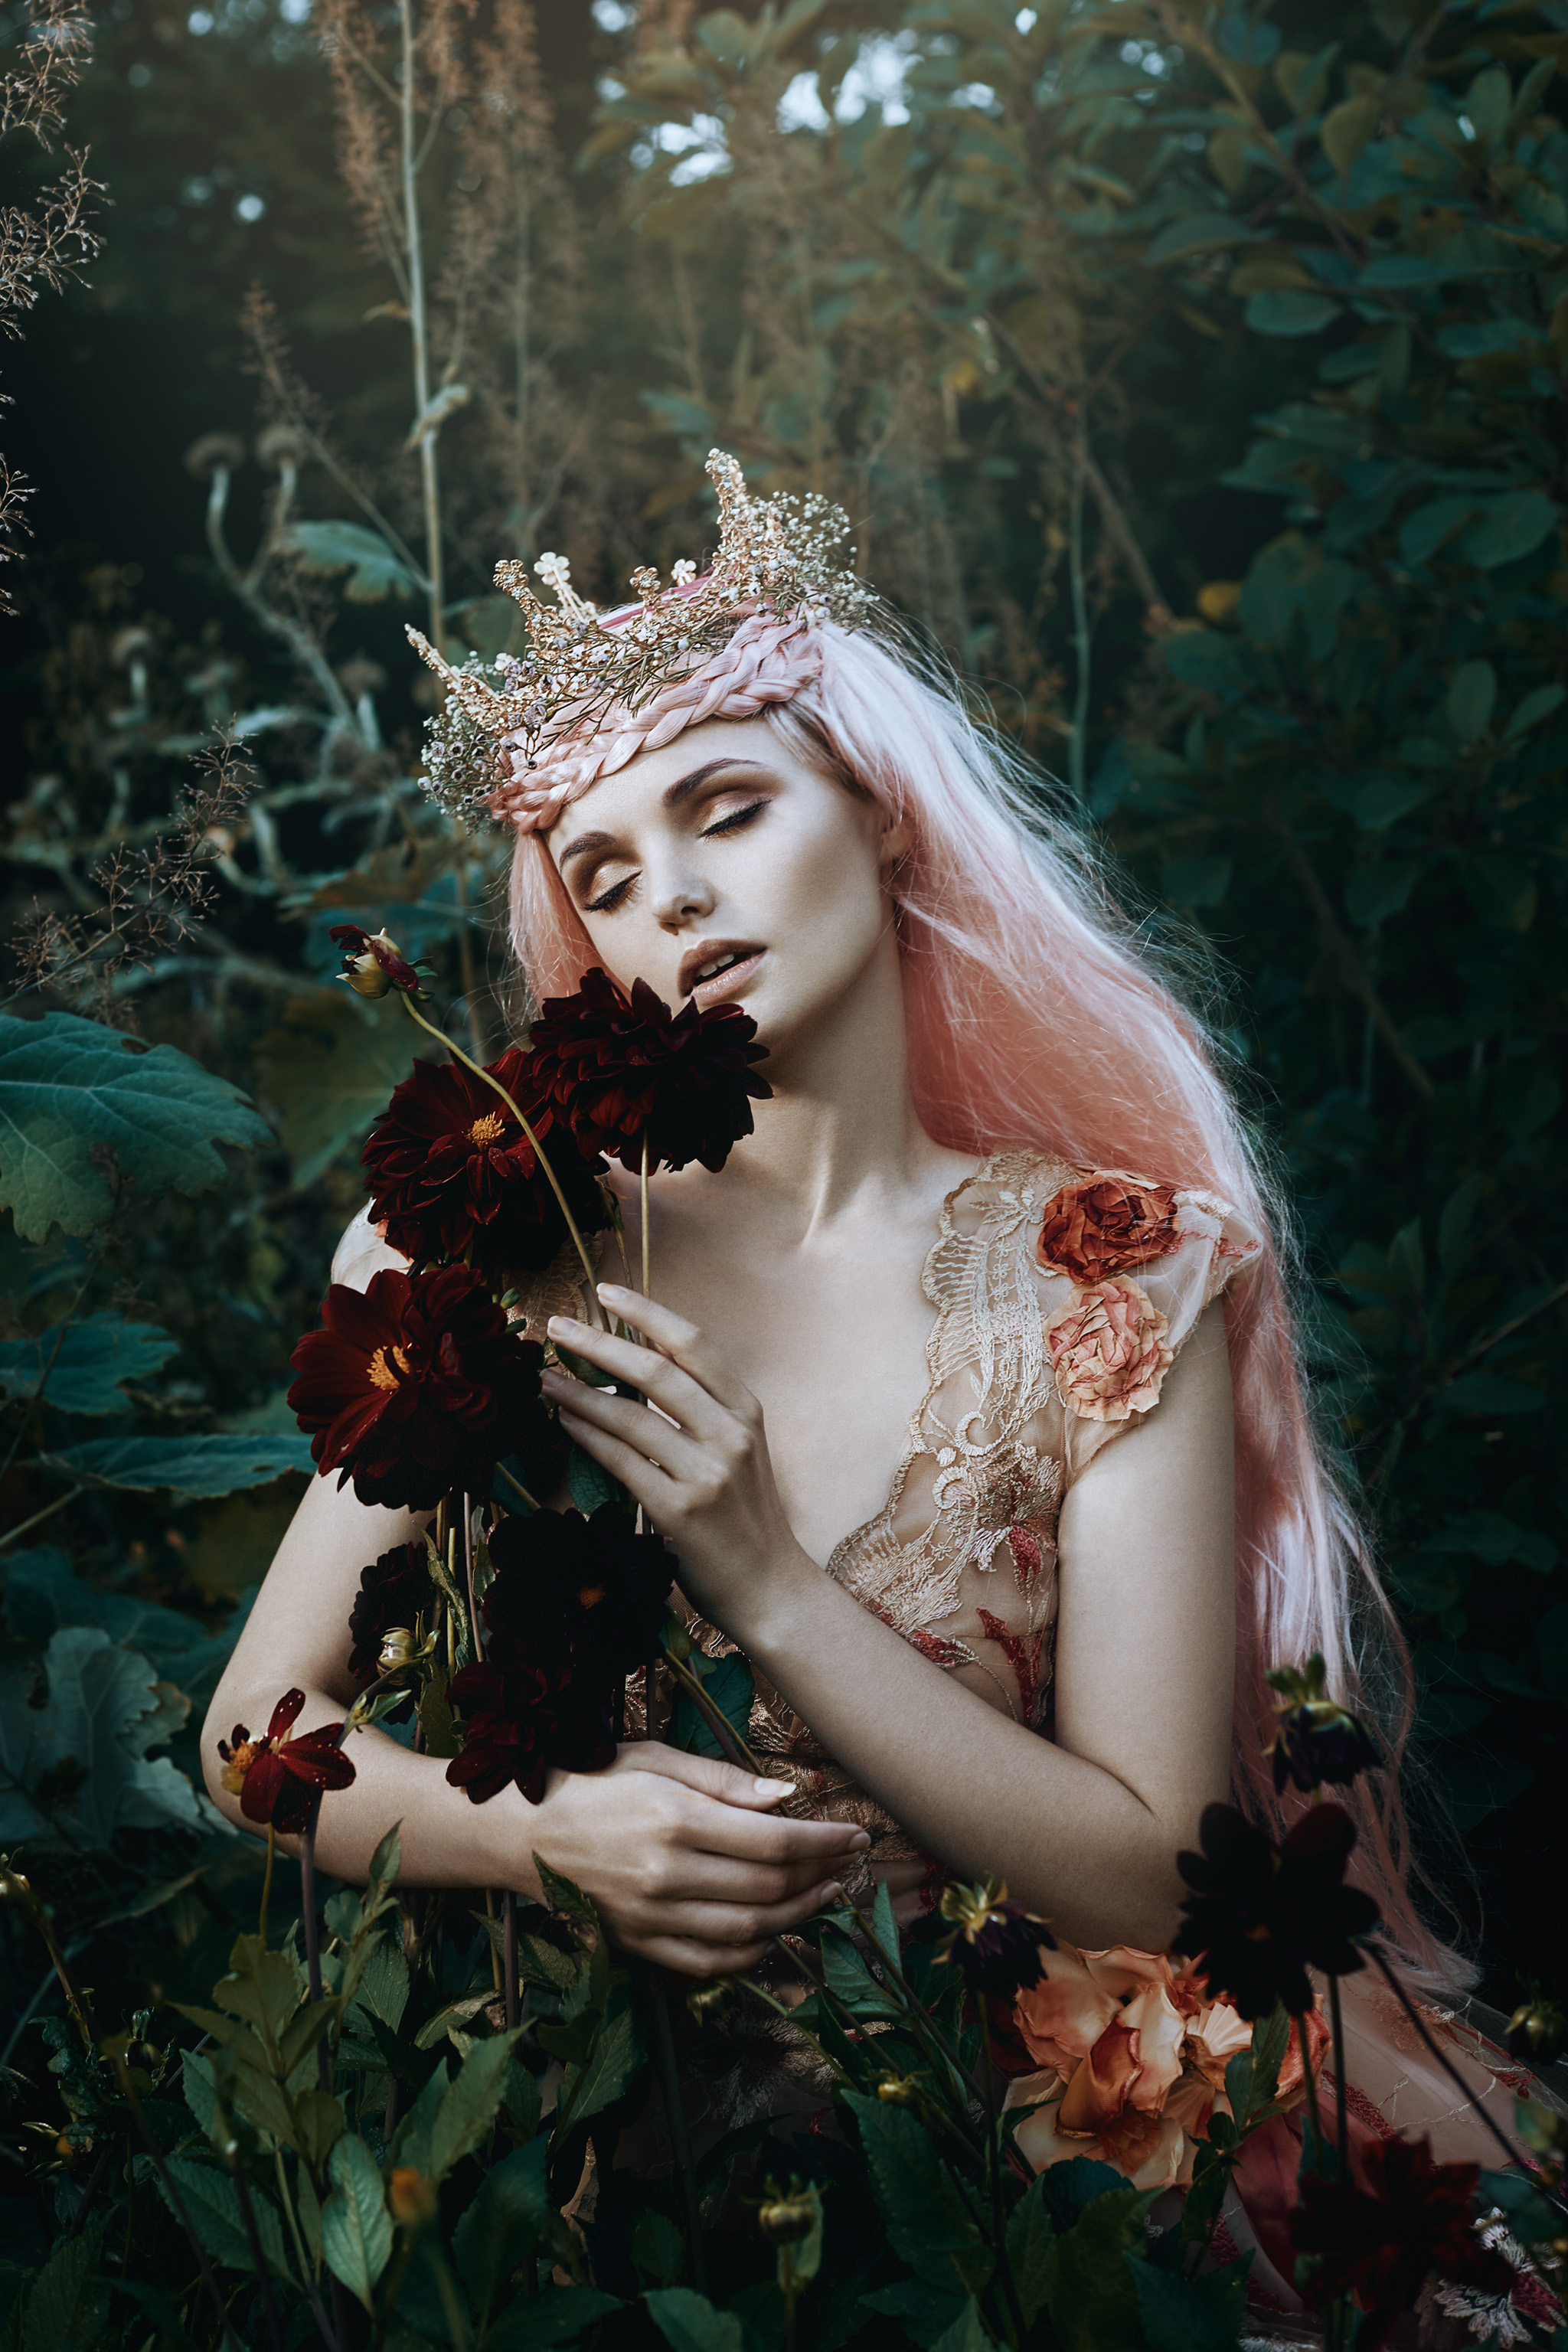 Bella_Kotak_Profoto_Canon_Fairytale_Fantasy_Photography_Portrait_Portraiture_Flowers_FLoral_Queen_Princess_Disney_Fashion_Editorial_A1_Lighting_Pink_Hair_Magical_Ethereal_Solstice_Retouch_4.jpg